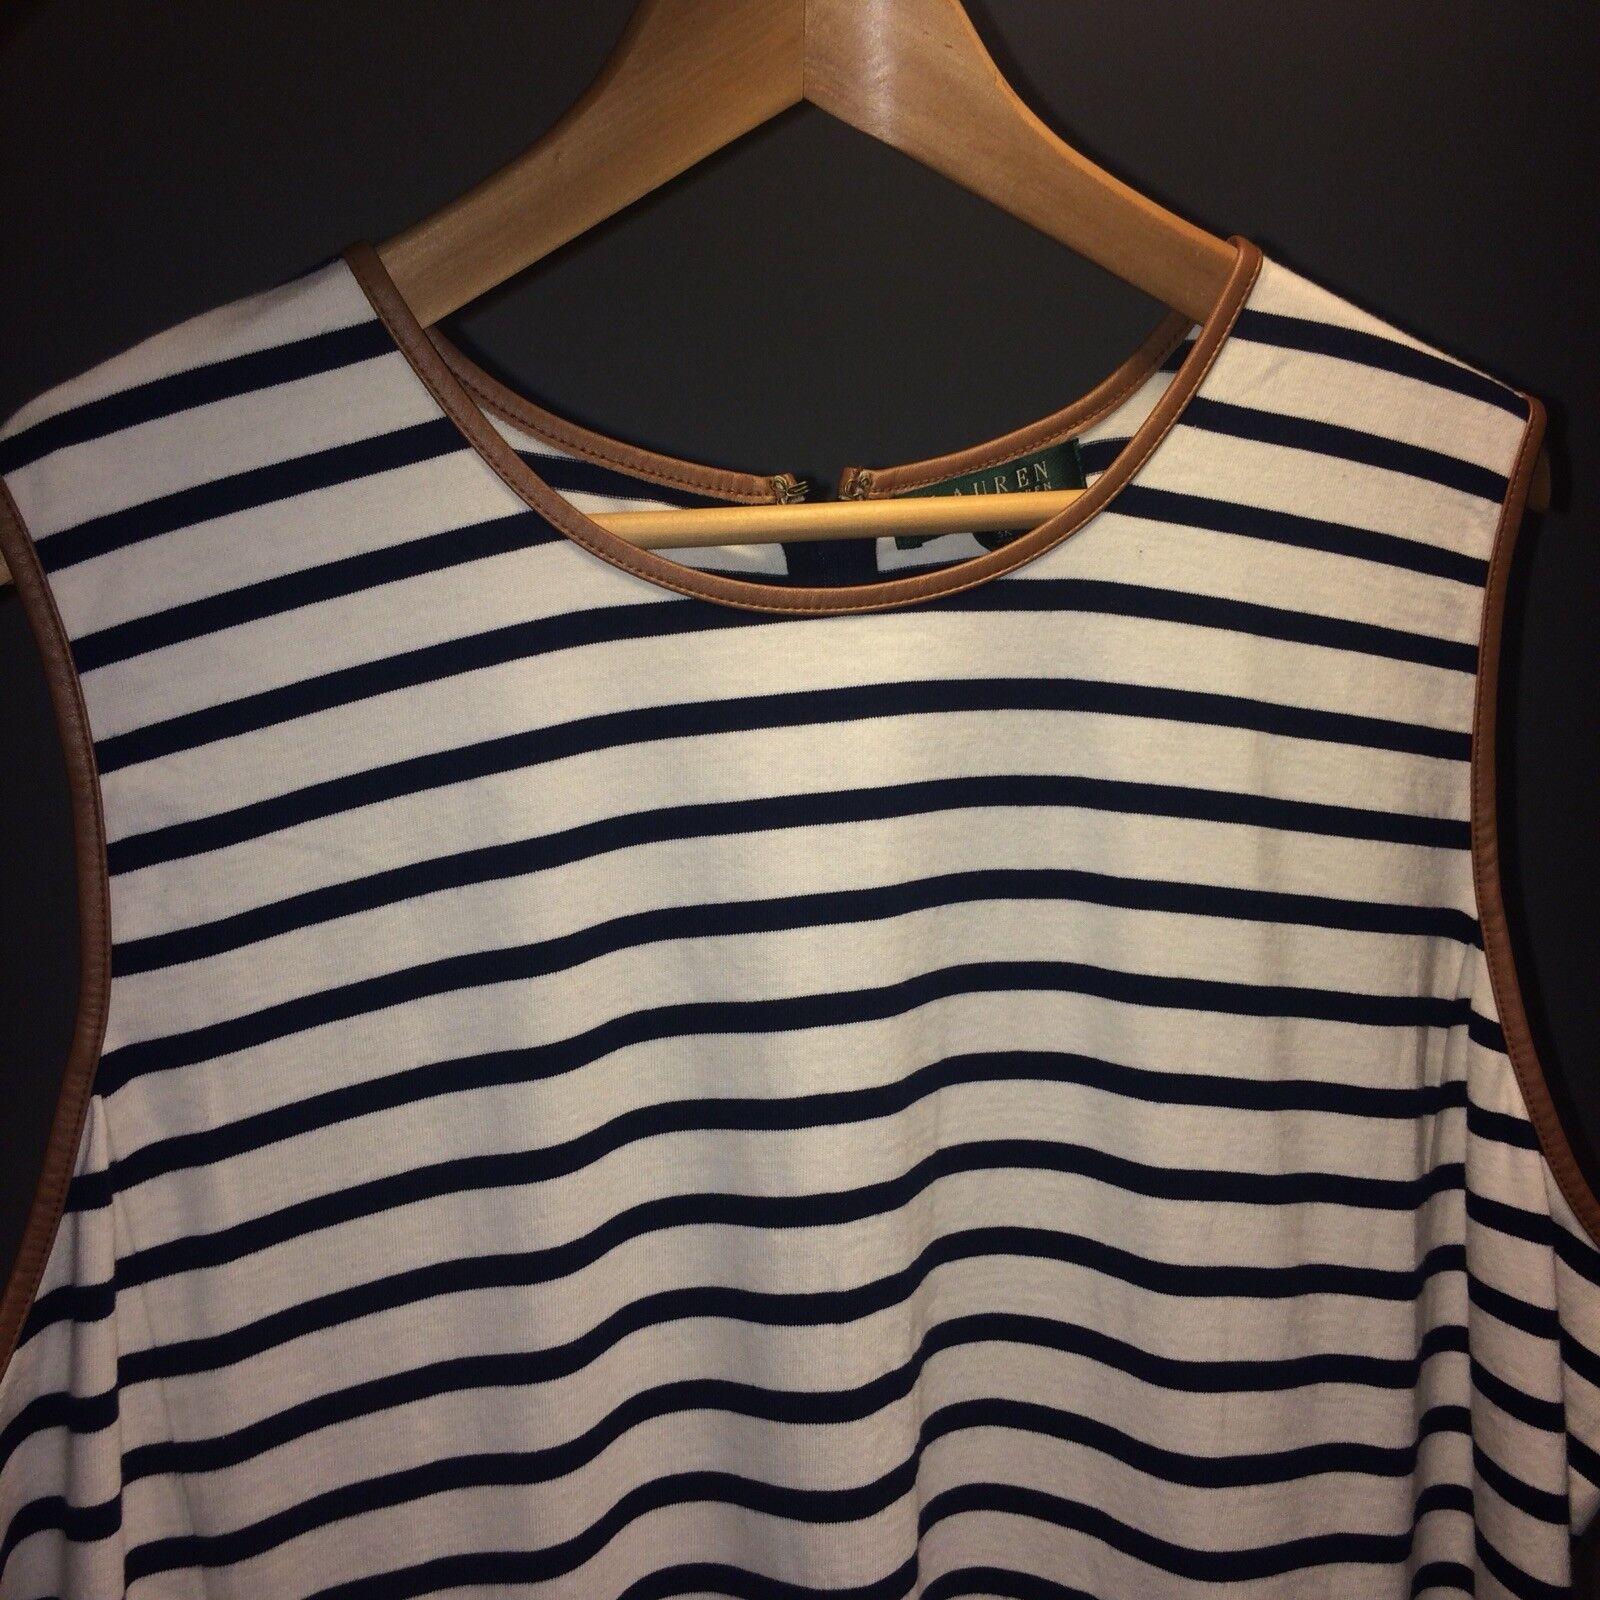 Lauren by by by Ralph Lauren Sleeveless Slimming Plus Stripe Dress Leather Details 3XL 6979d4